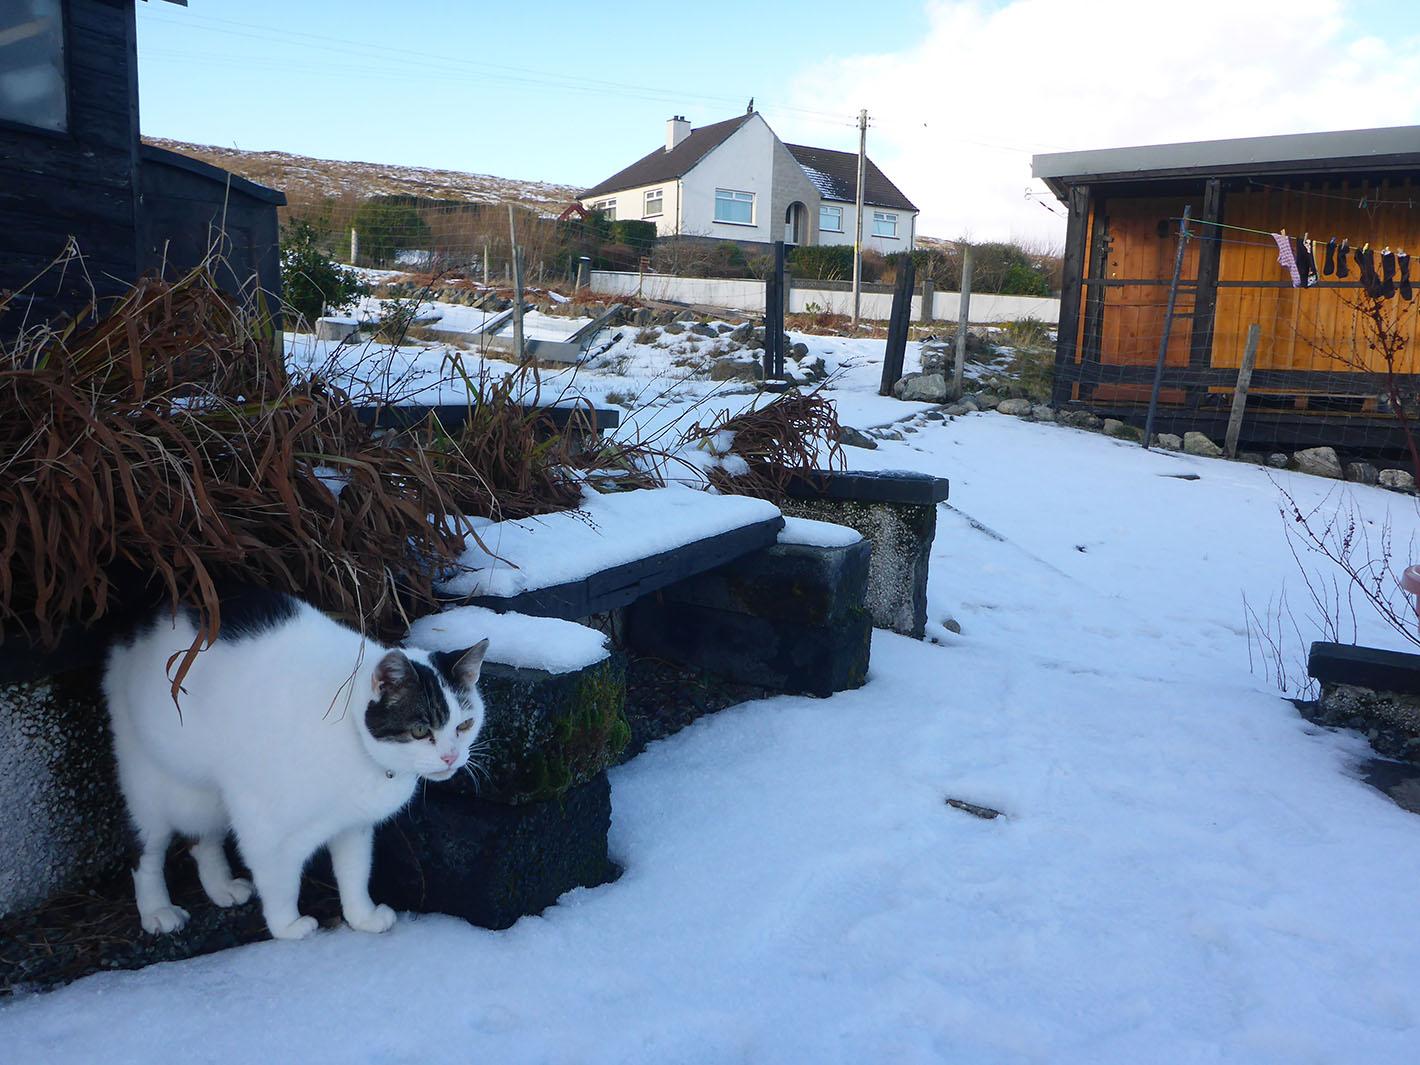 18 Ray in garden